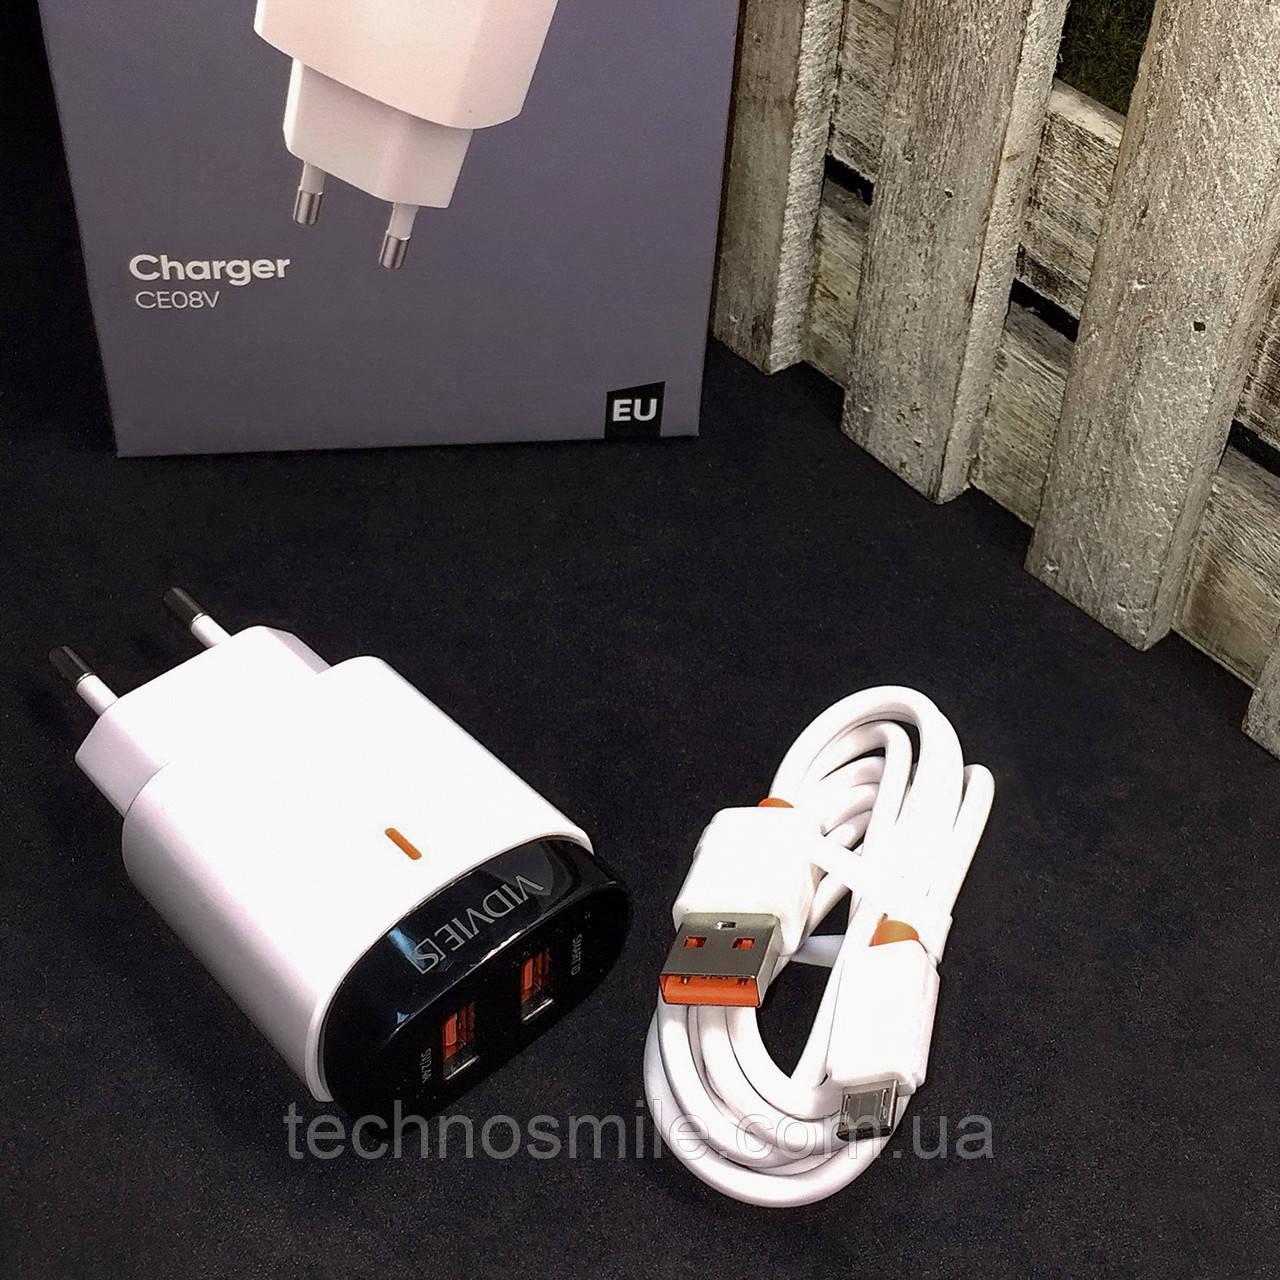 Кабель USB, кабель для зарядки, шнур USB, USB кабель для телефону, зарядка VIDVIE CE08 micro cable